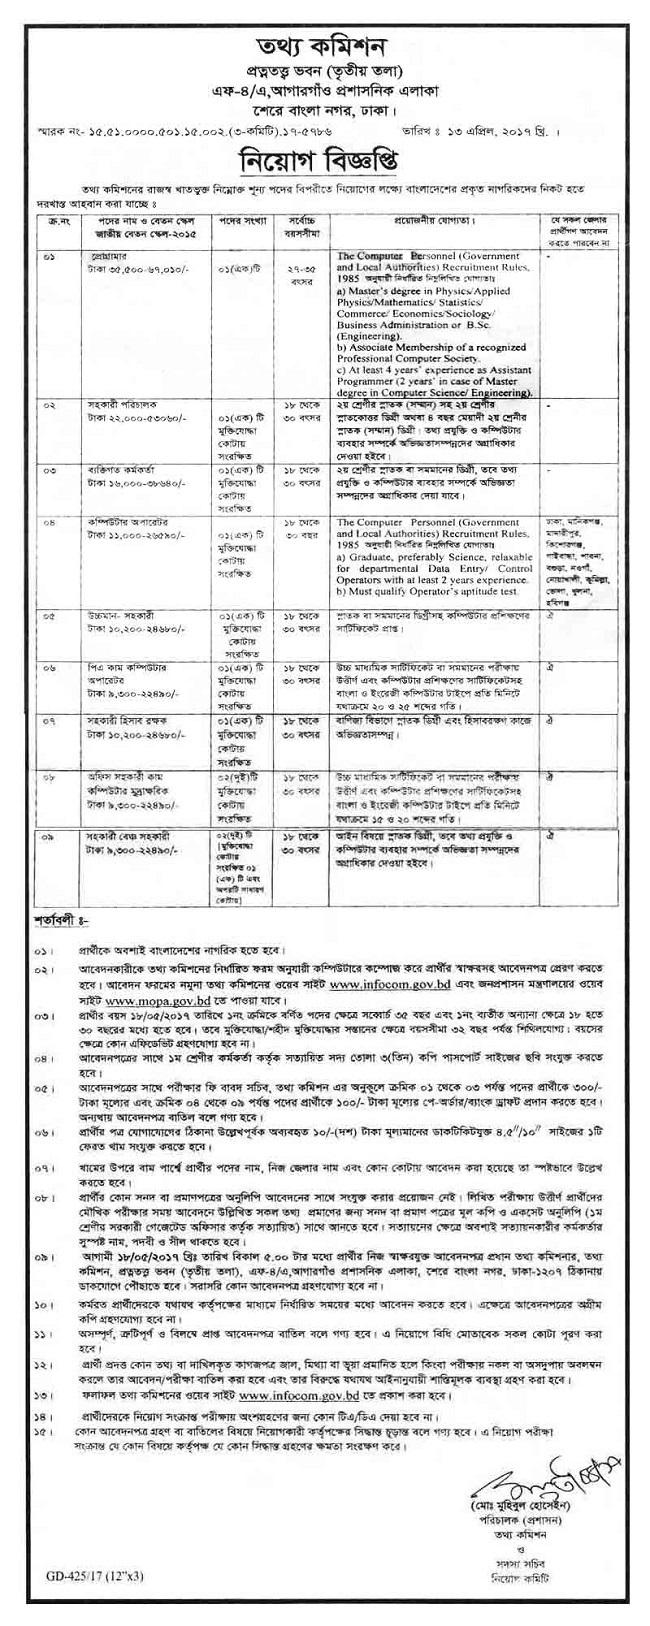 Information Commission Job Circular